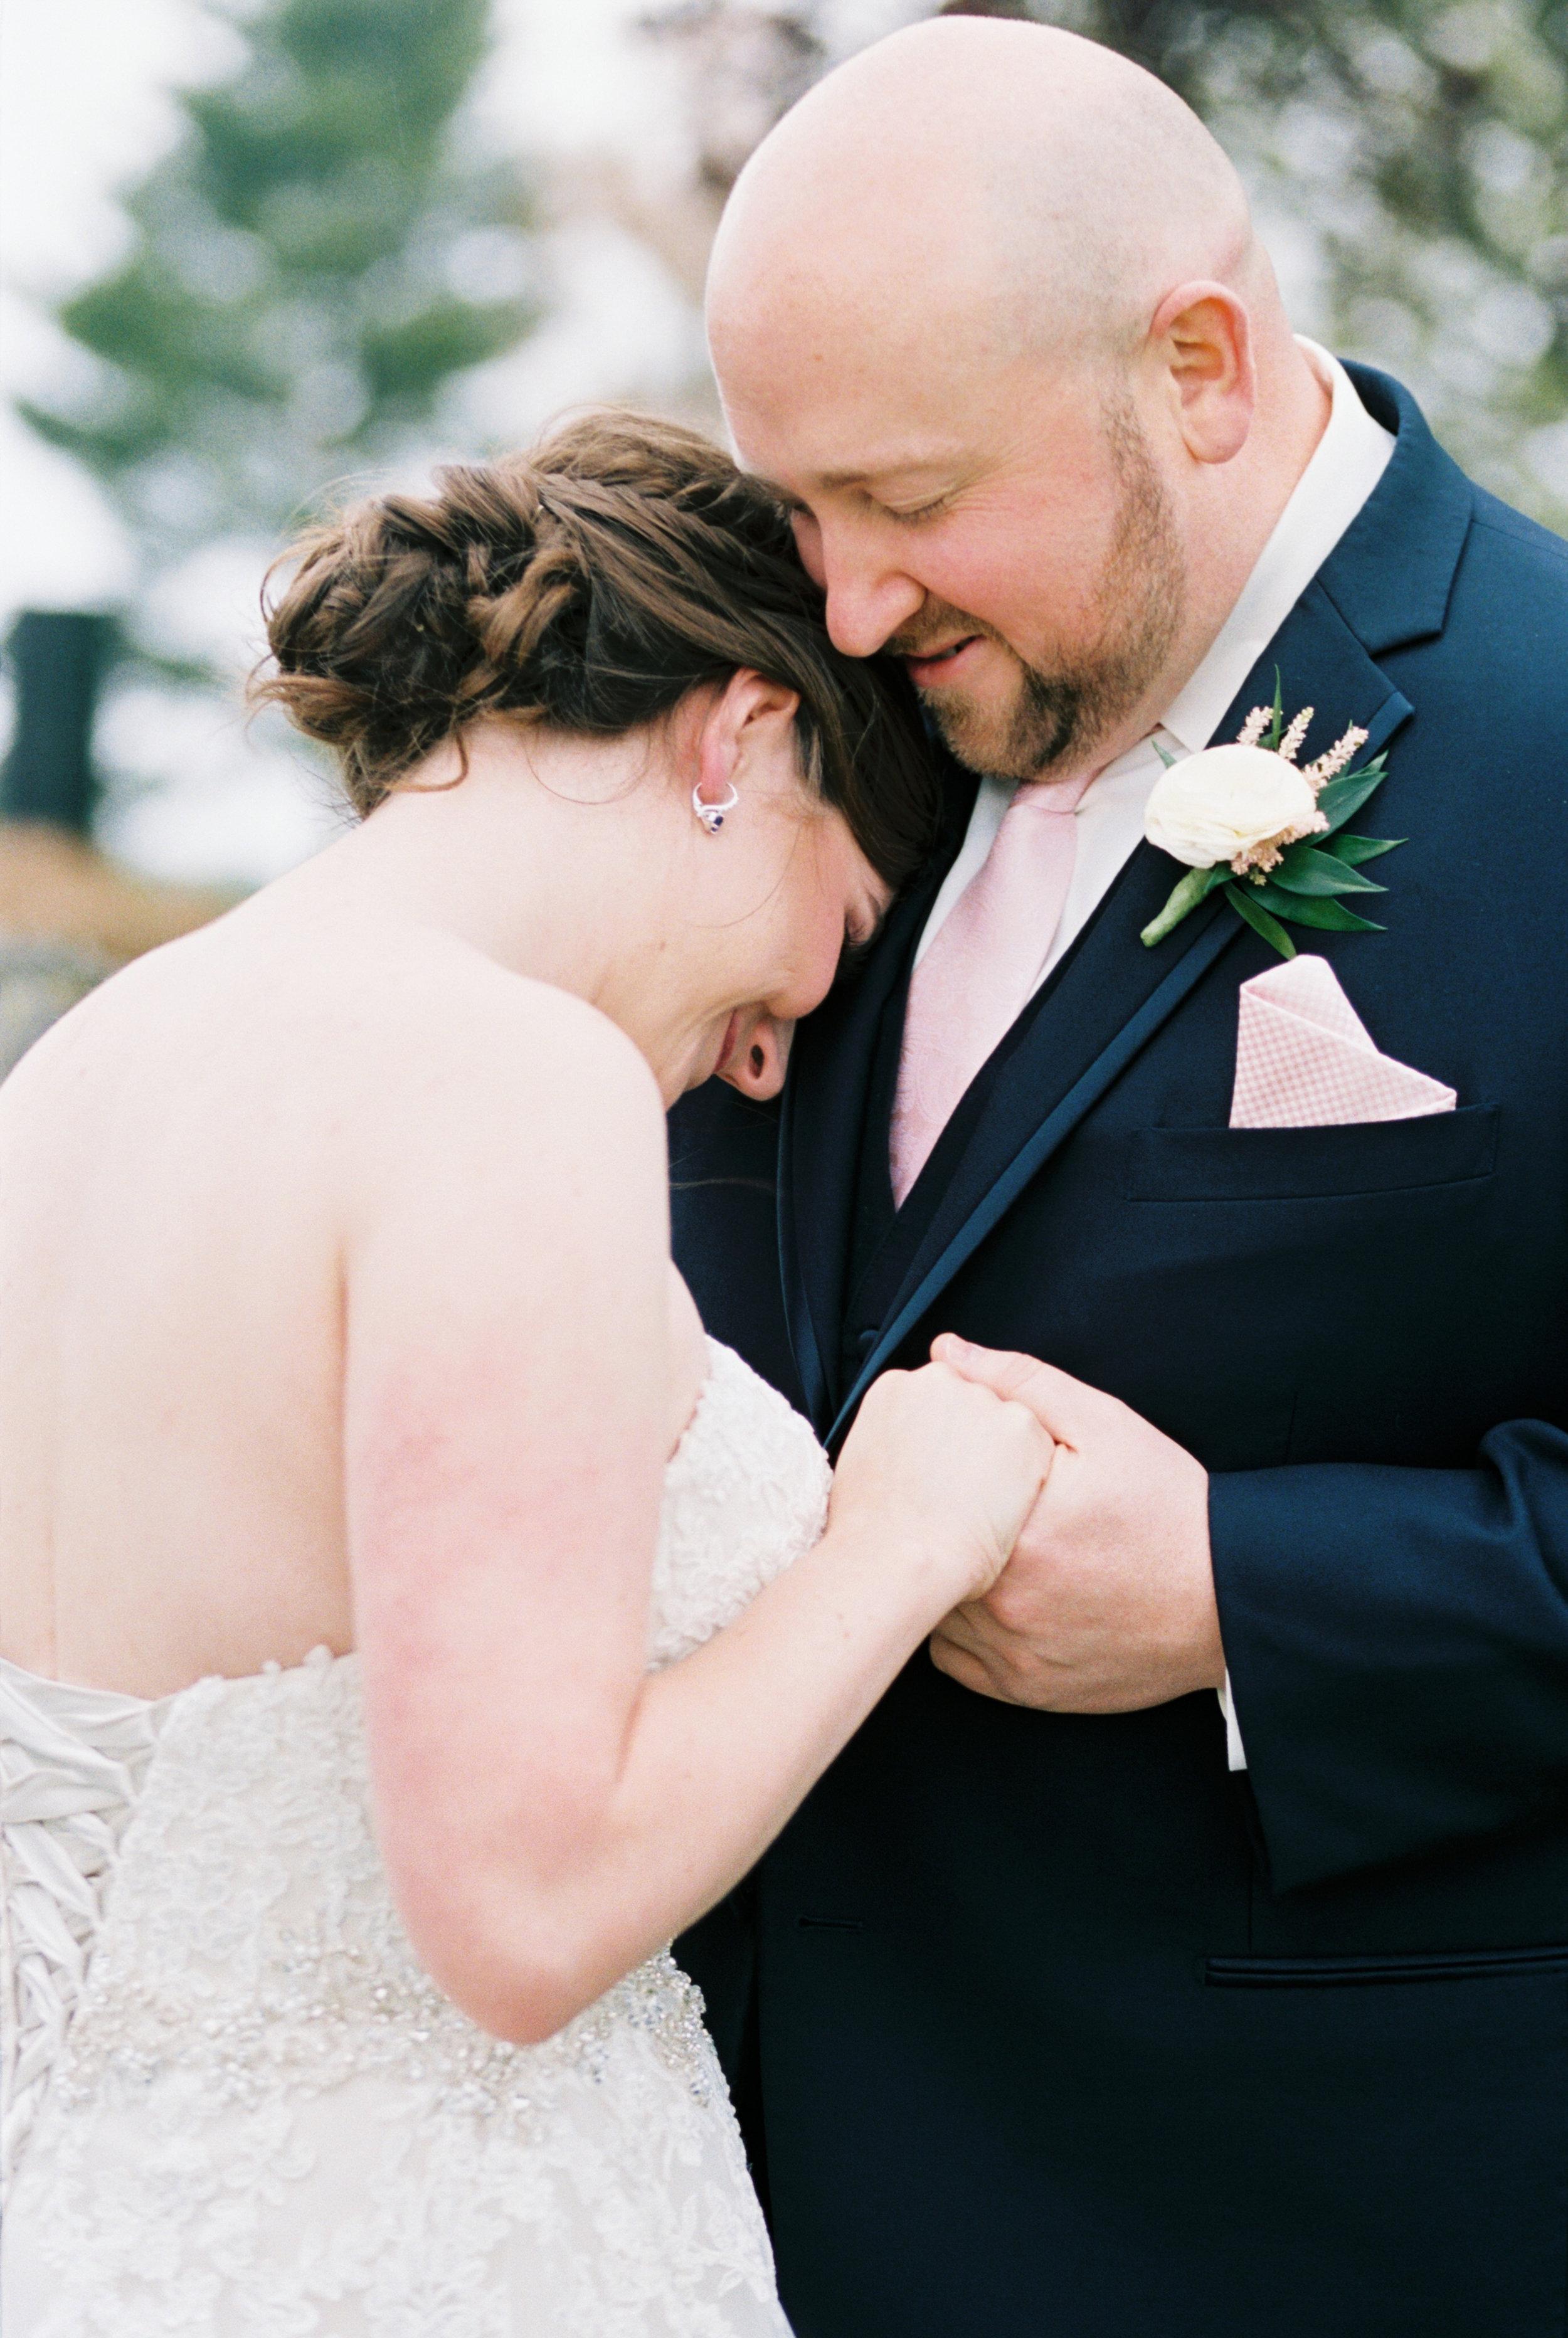 Lydia_johnathan_Wedding_Abigail_Malone_Photography-203.jpg